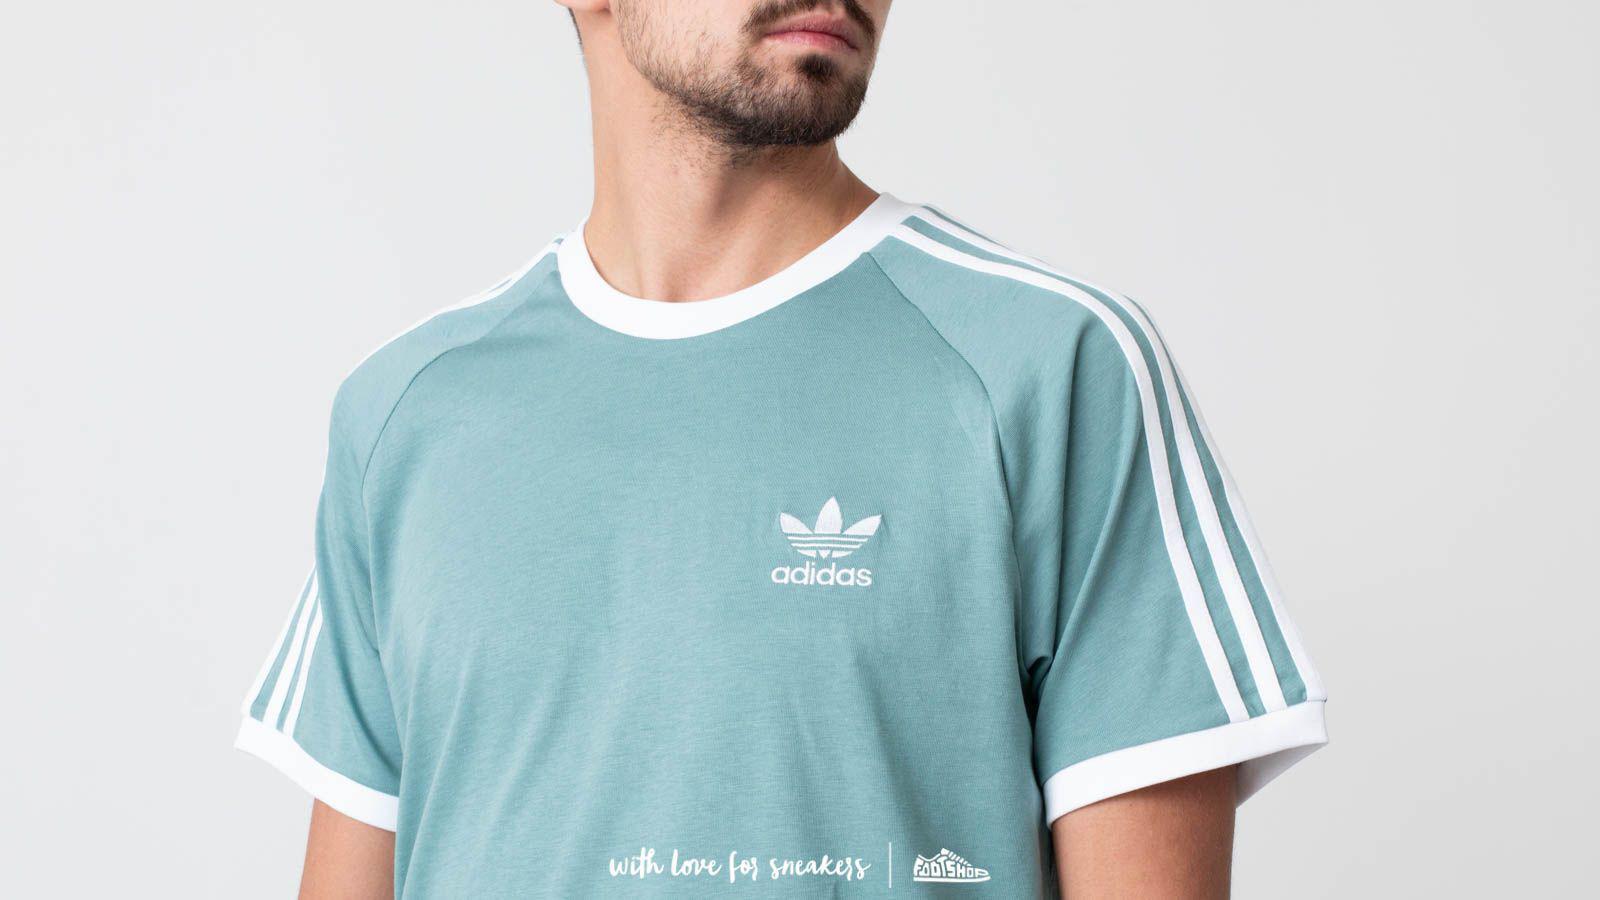 09e89816b9 adidas Originals Adidas 3-stripes Tee Vapour Steel in Blue for Men ...